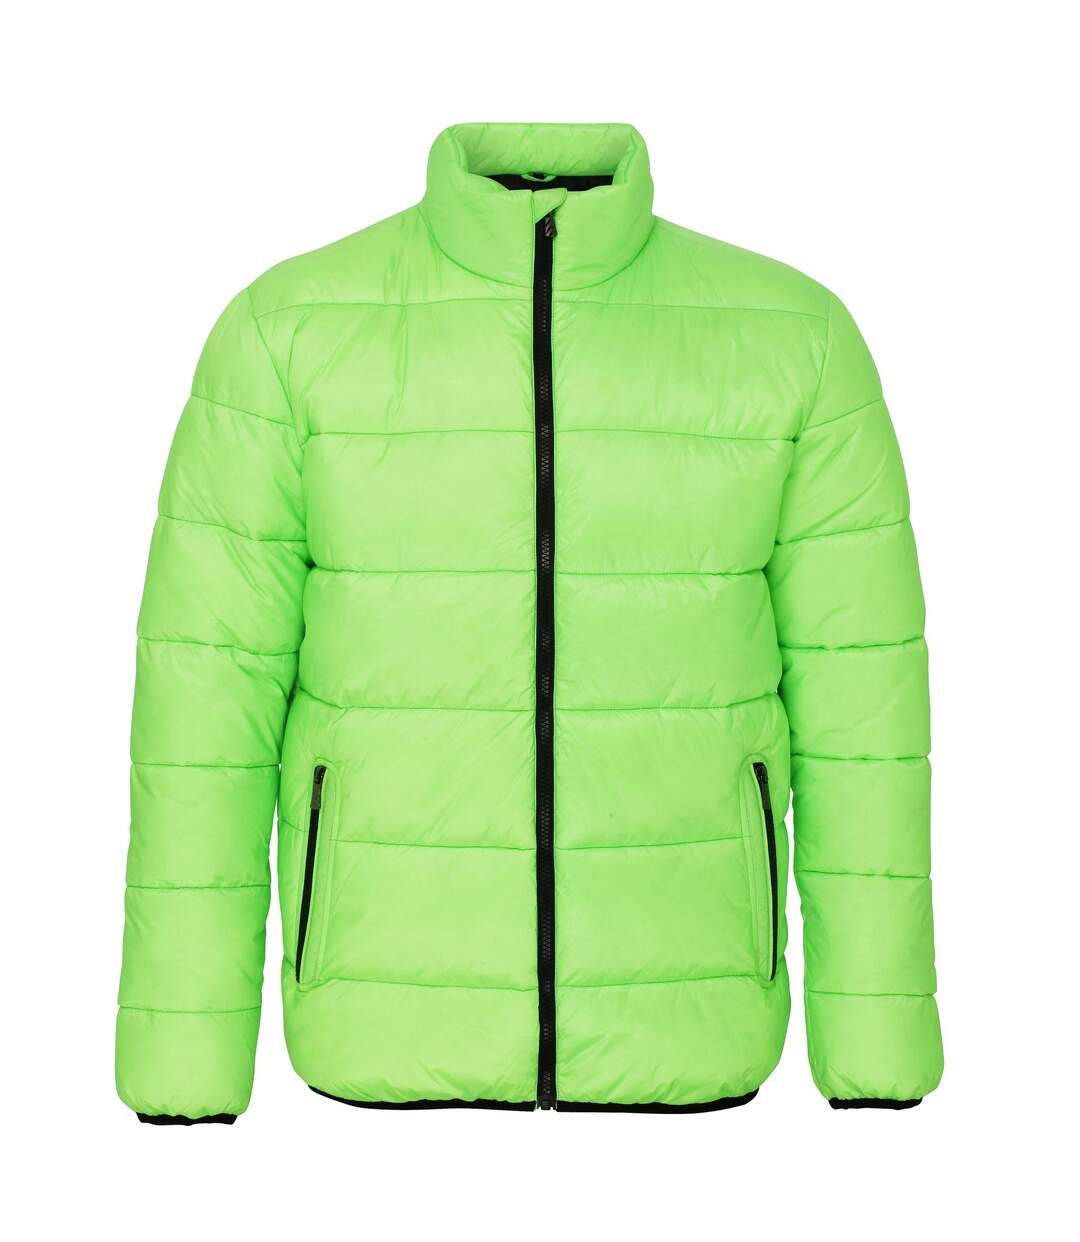 2786 Mens Venture Supersoft Padded Full Zip Jacket (Lime / Black) - UTRW3848